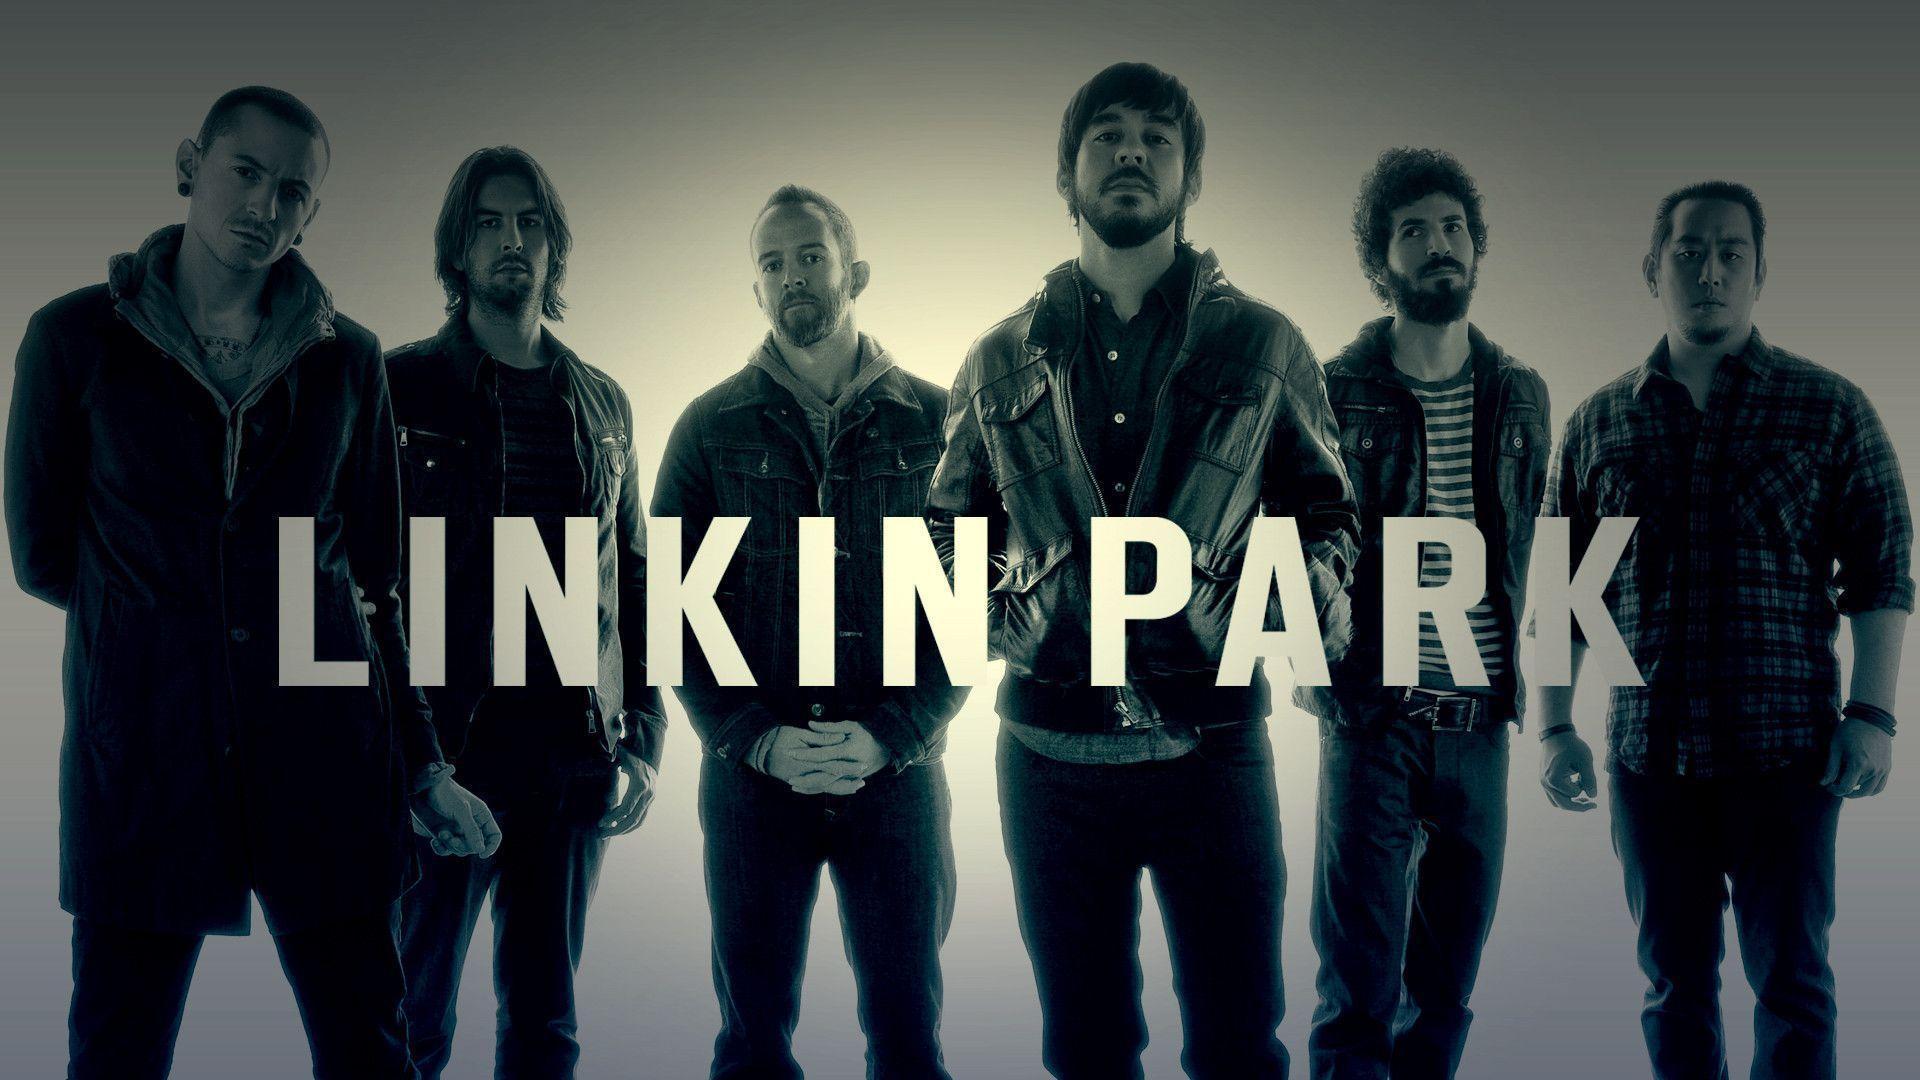 Linkin Park Wallpapers HD 2015 - Wallpaper Cave